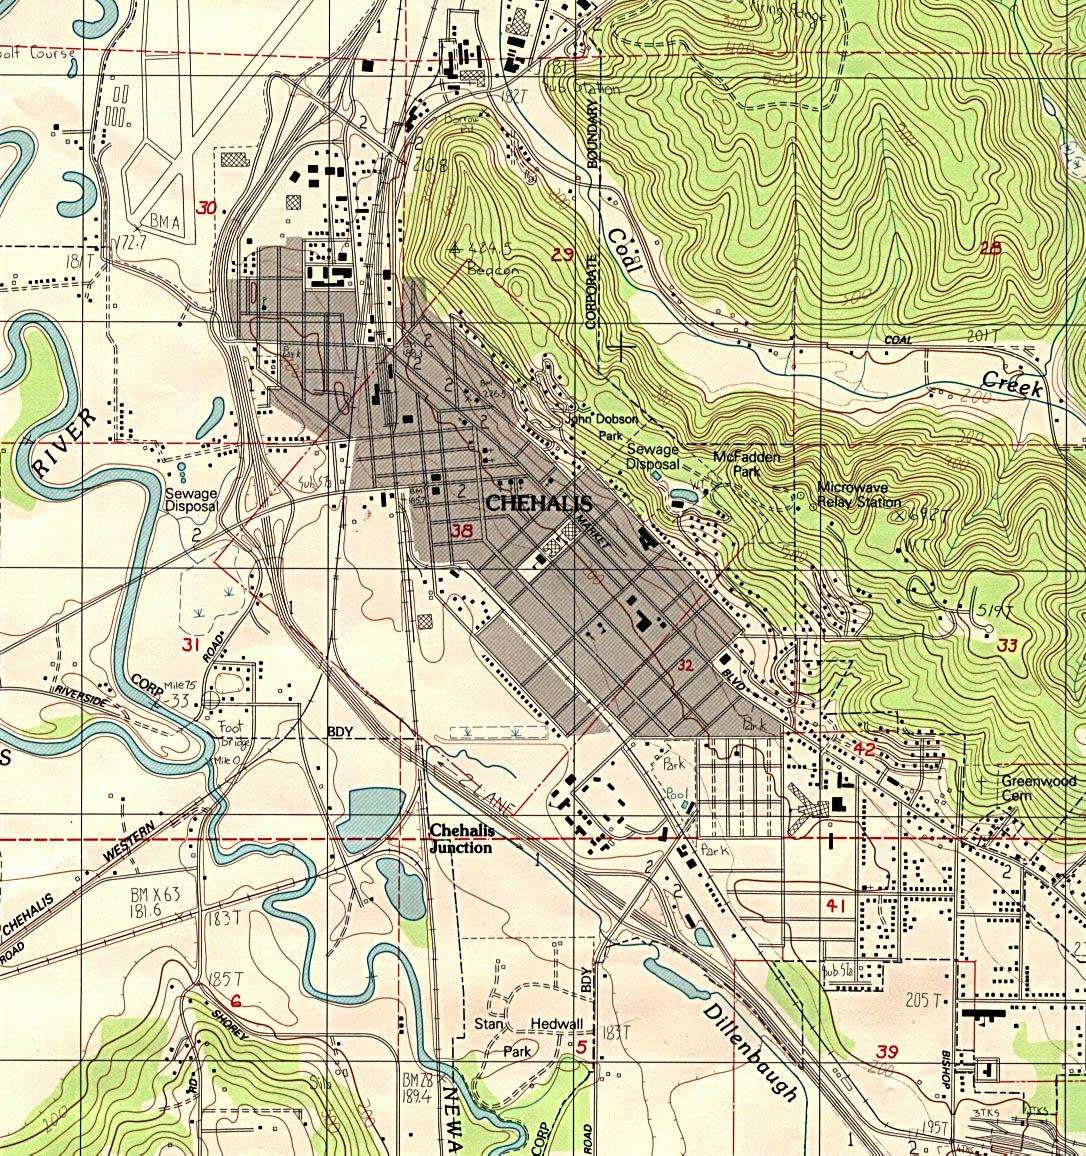 Chehalis Topographic City Map, Washington, United States